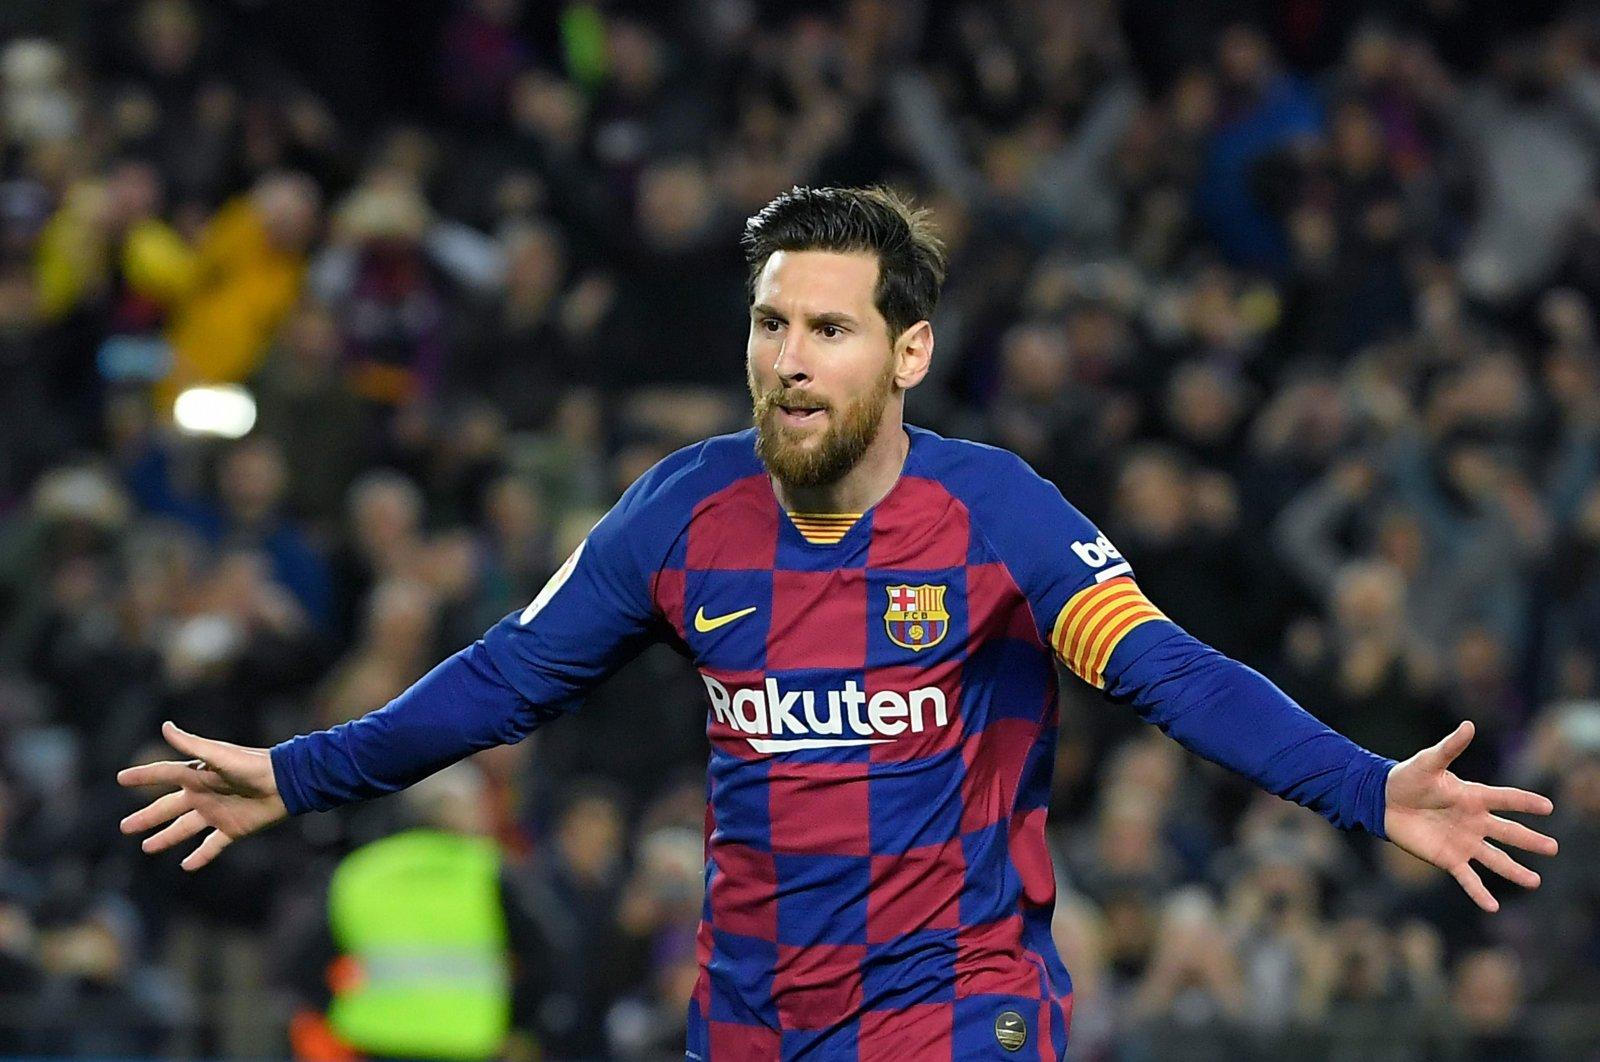 Lionel Messi celebrates a goal during a La Liga match in Barcelona, Spain, March 7, 2020. (AFP Photo)